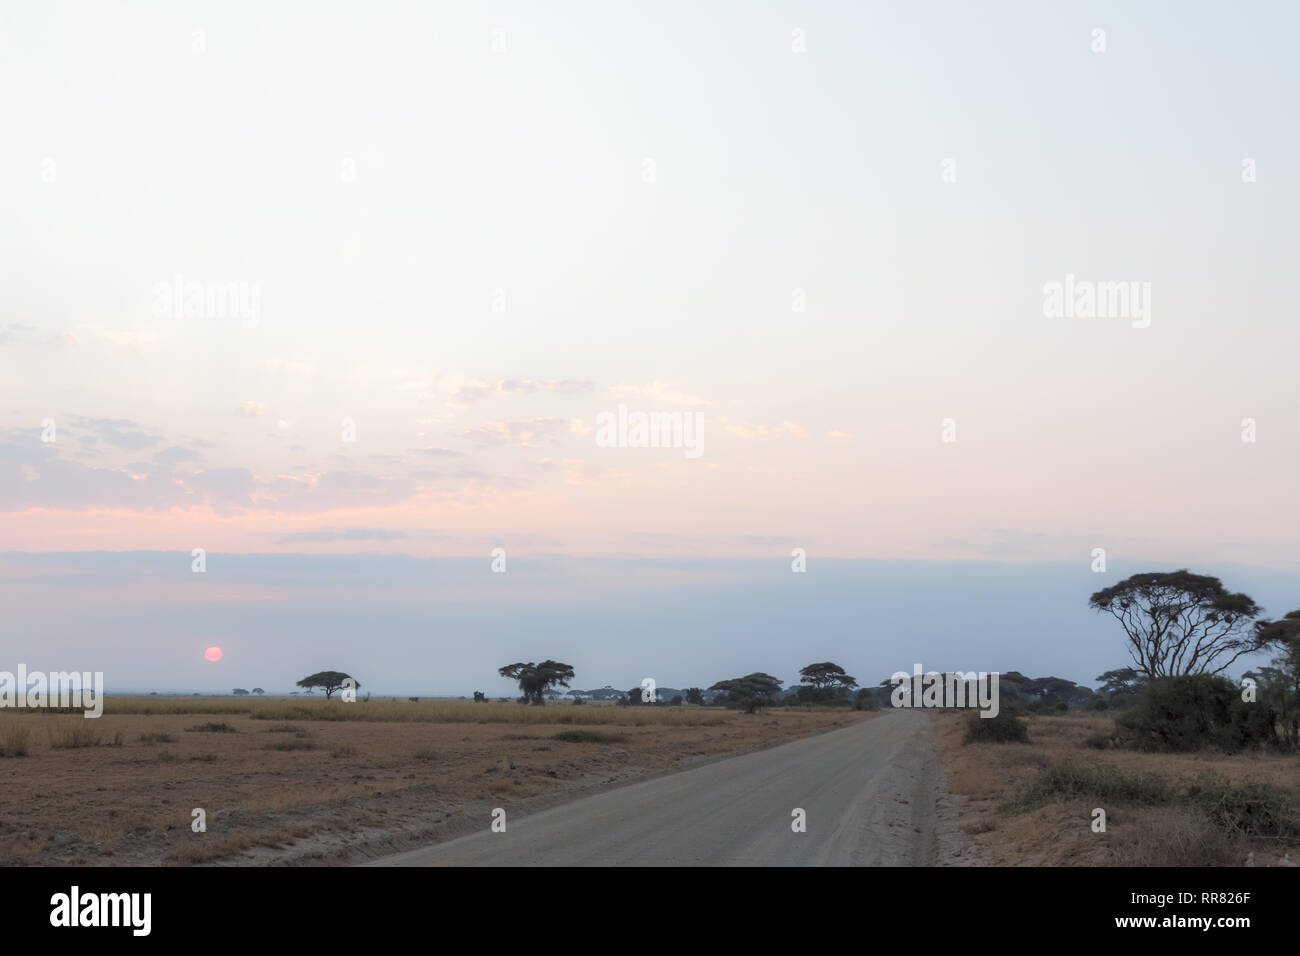 Sunset. Landscape in the Savannah Amboseli. Kenya, Africa (Rev.2) - Stock Image